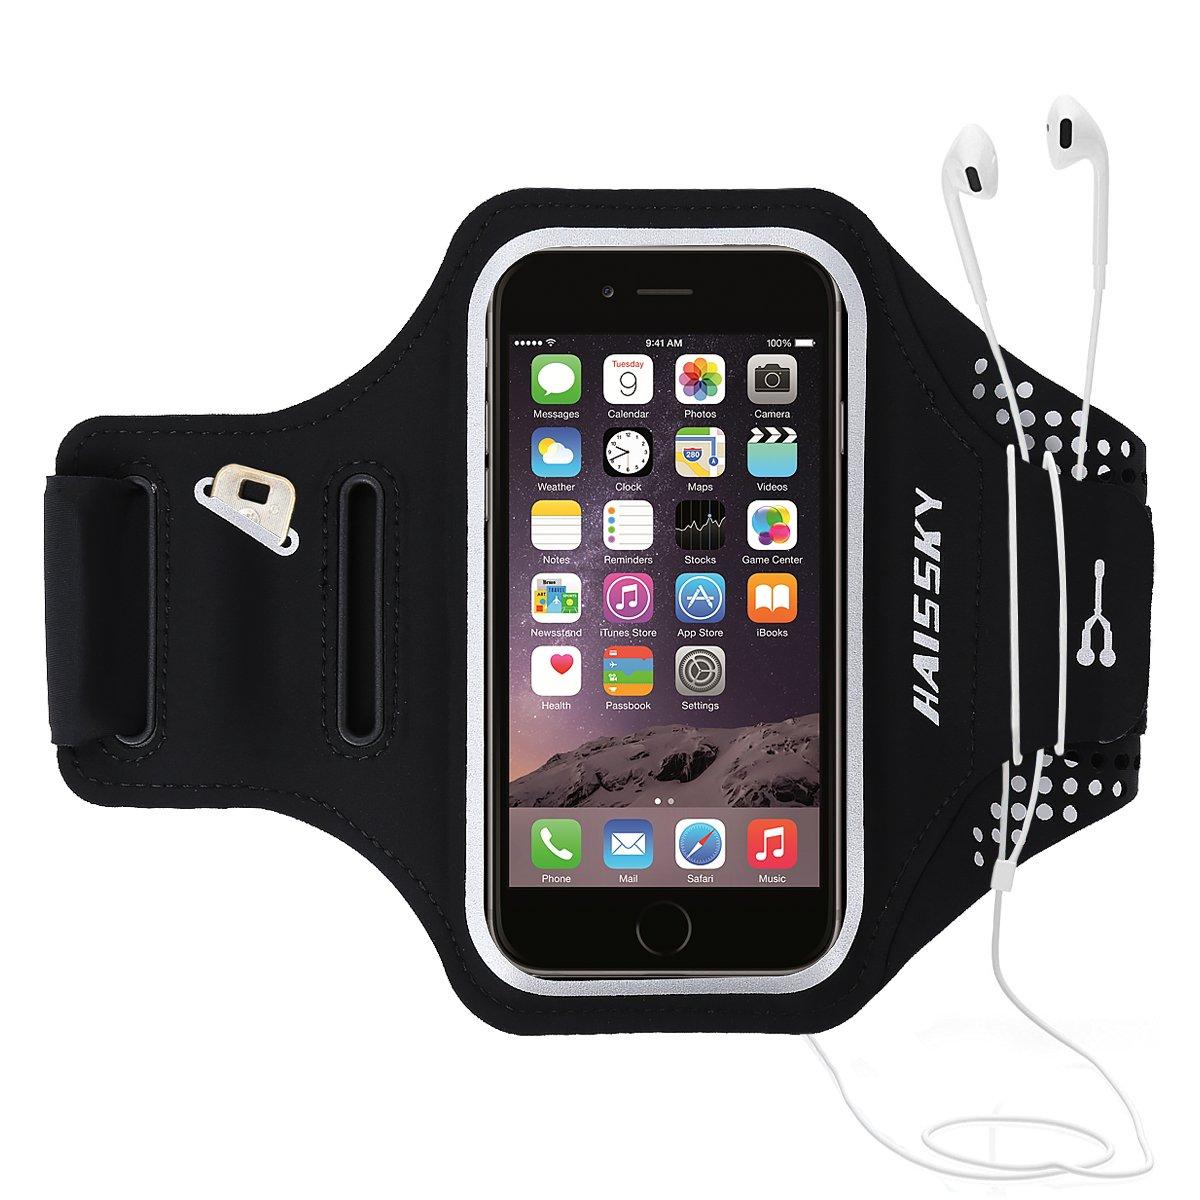 Resistente Acqua Huawei LG Cinturino Regolabile Bracciale Sports Armband per iPhone 6 Plus//6s Plus//7 Plus//8 Plus Xiaomi Samsung Galaxy G2 Fascia Braccio Sportiva Running HTC